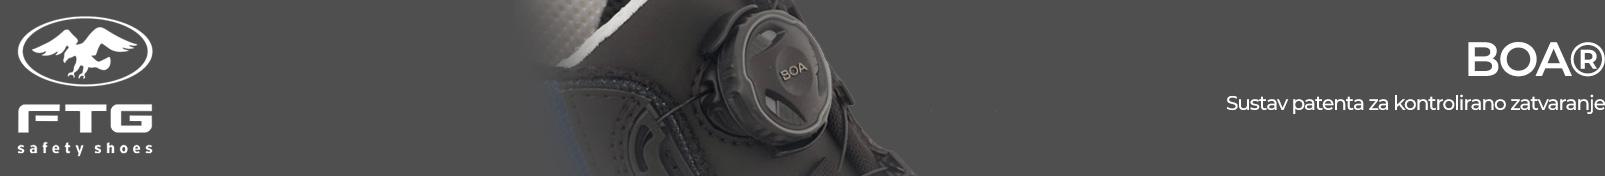 FTG - BOA tehnologija